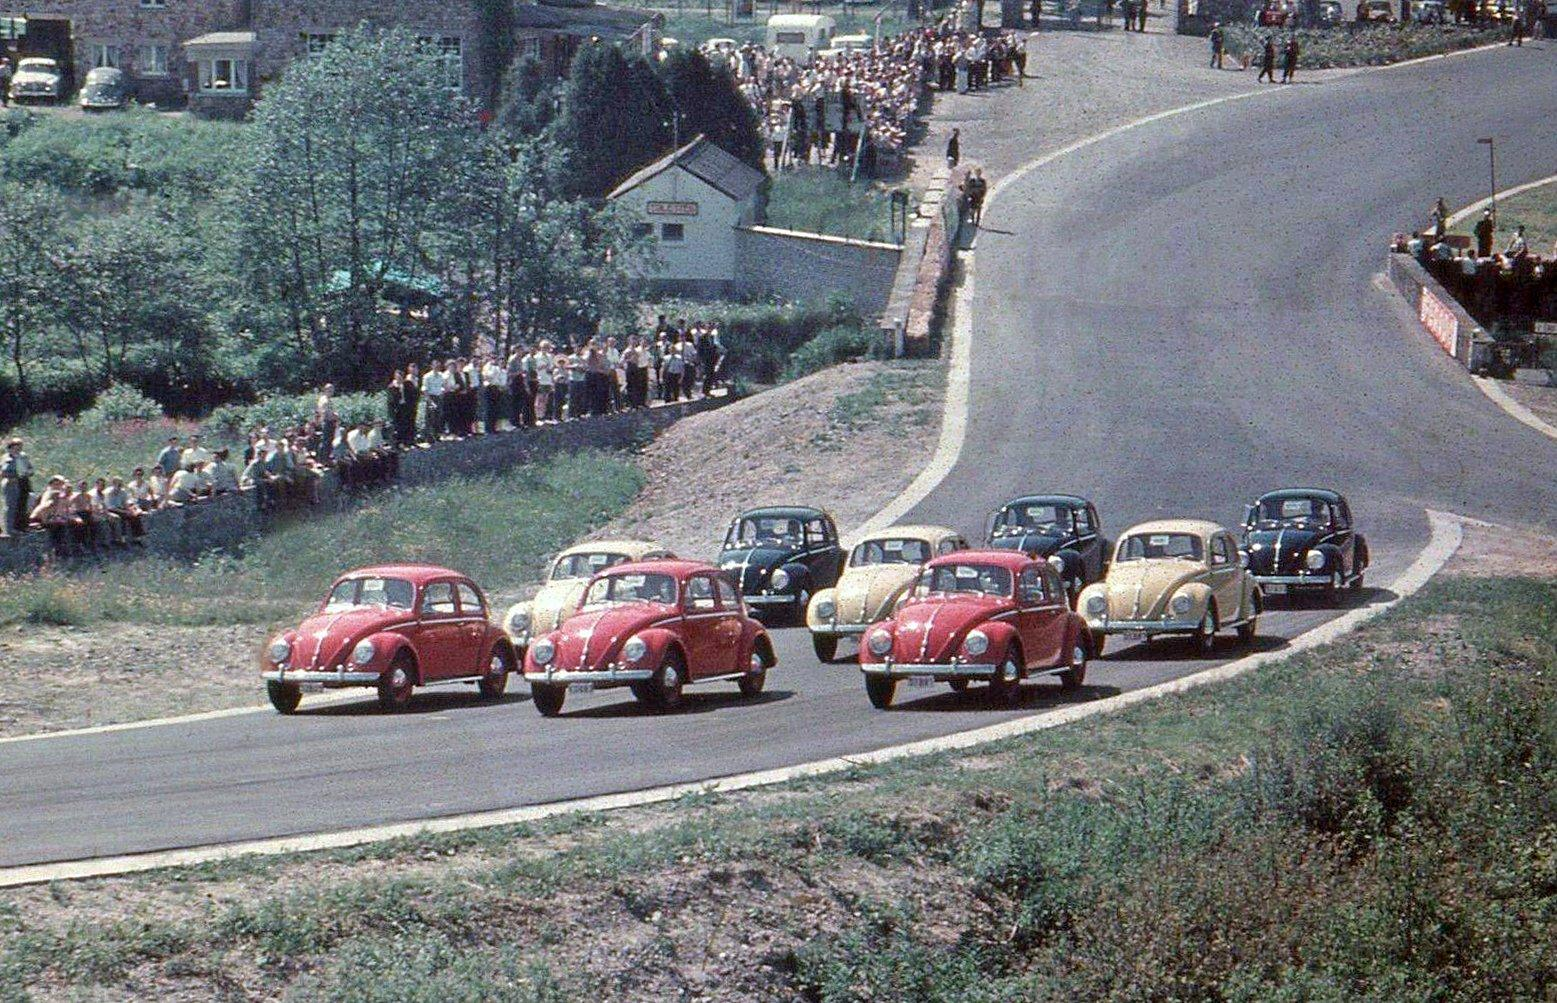 Beetles at Spa Francorchamps - Enhanced